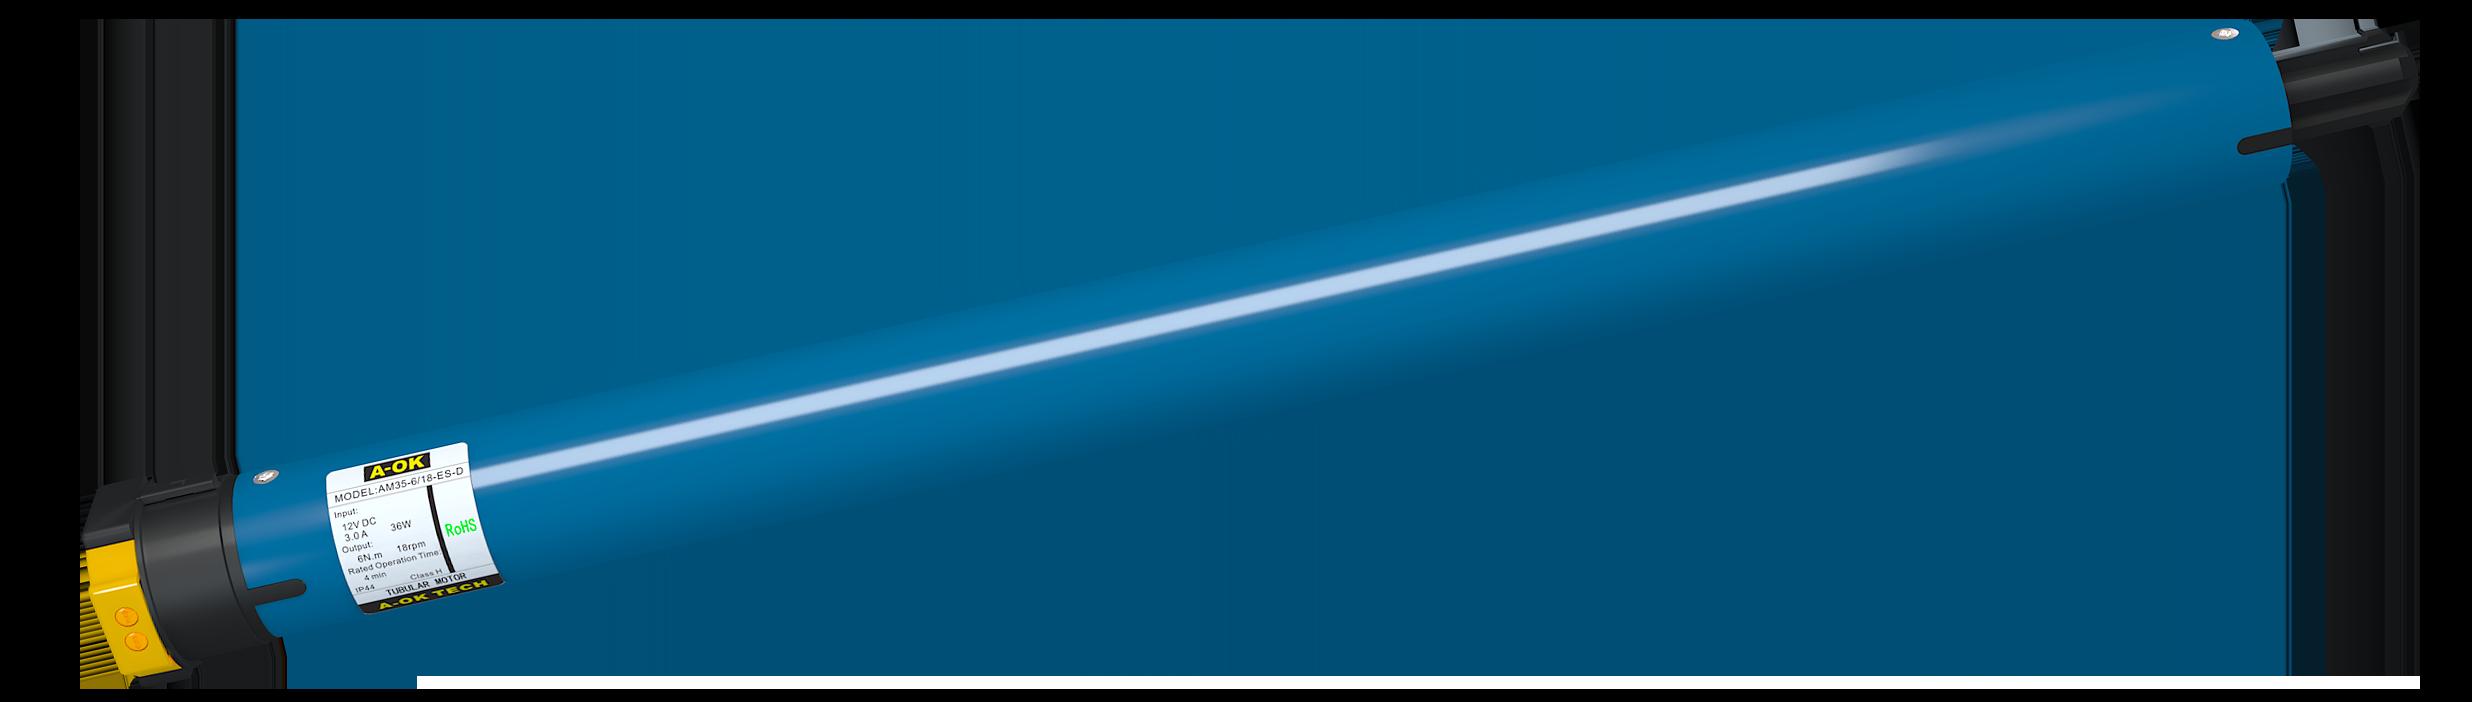 am35_1